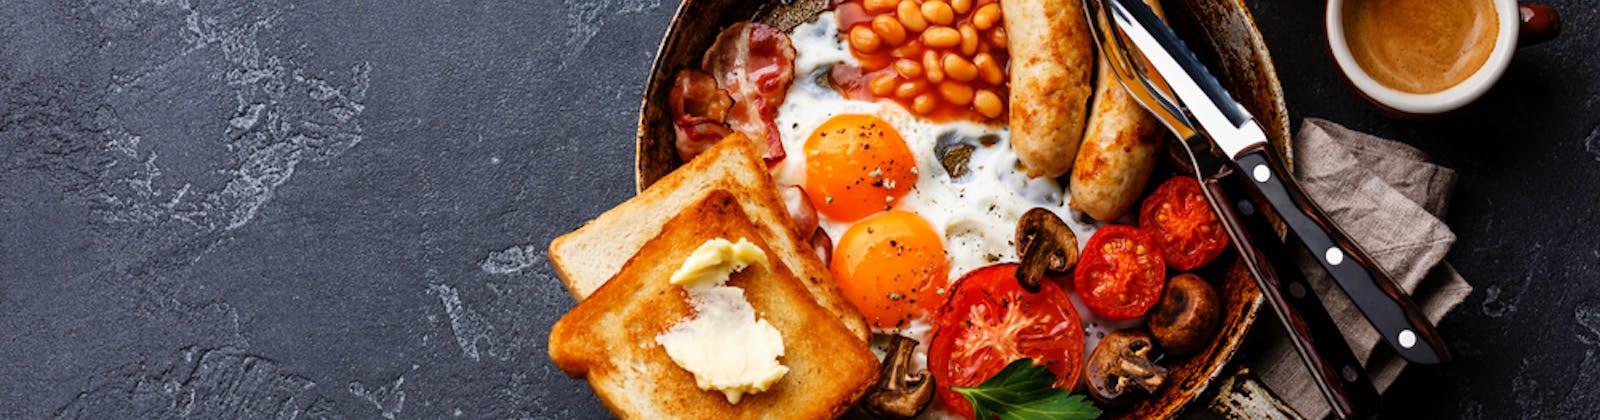 Big breakfast in a cast iron pan